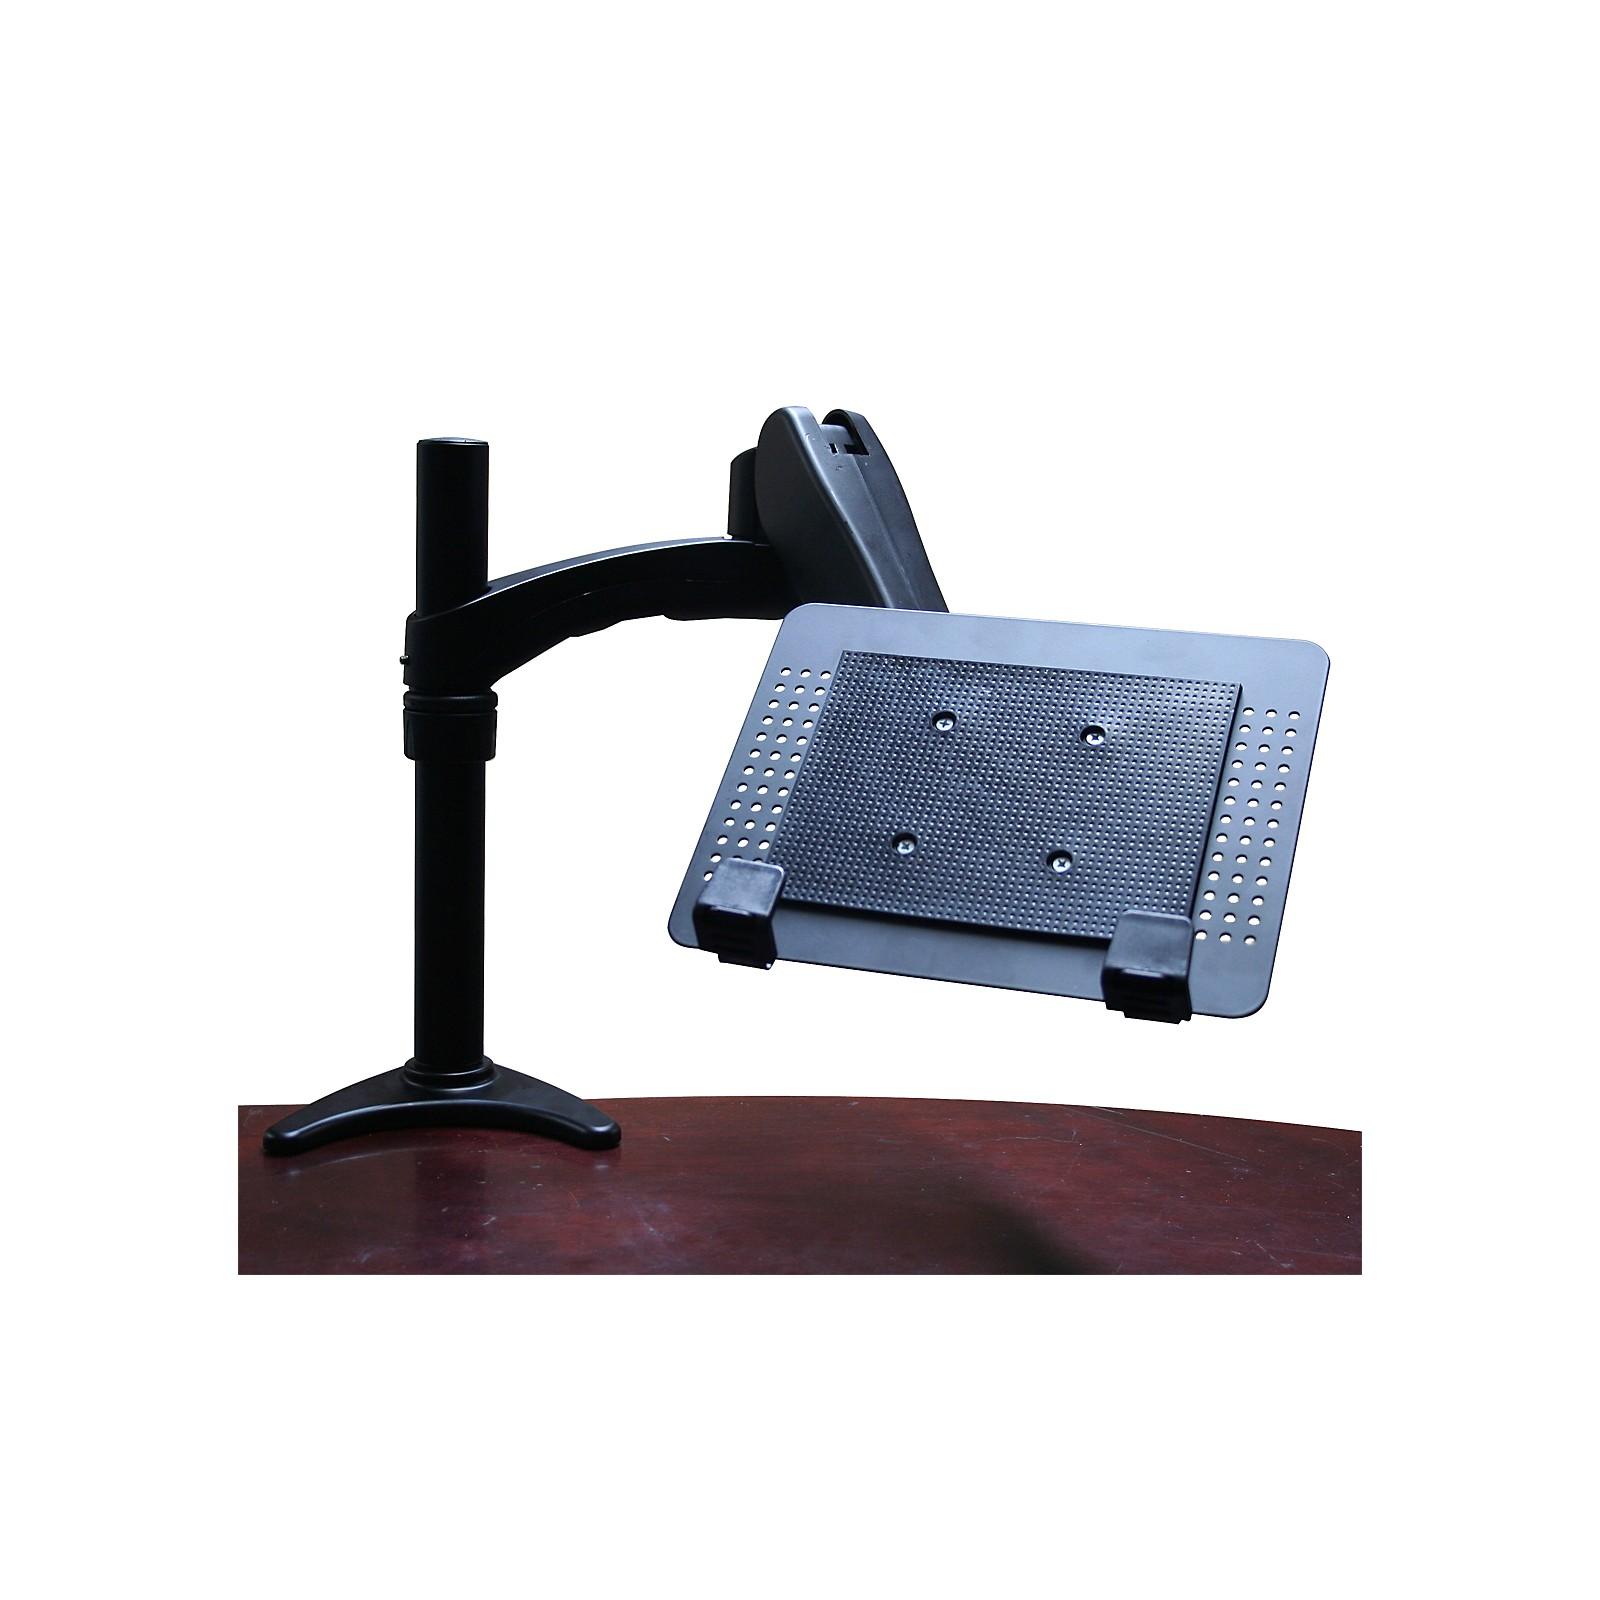 Gator 360 Degree Articulating Desk Mountable Arm